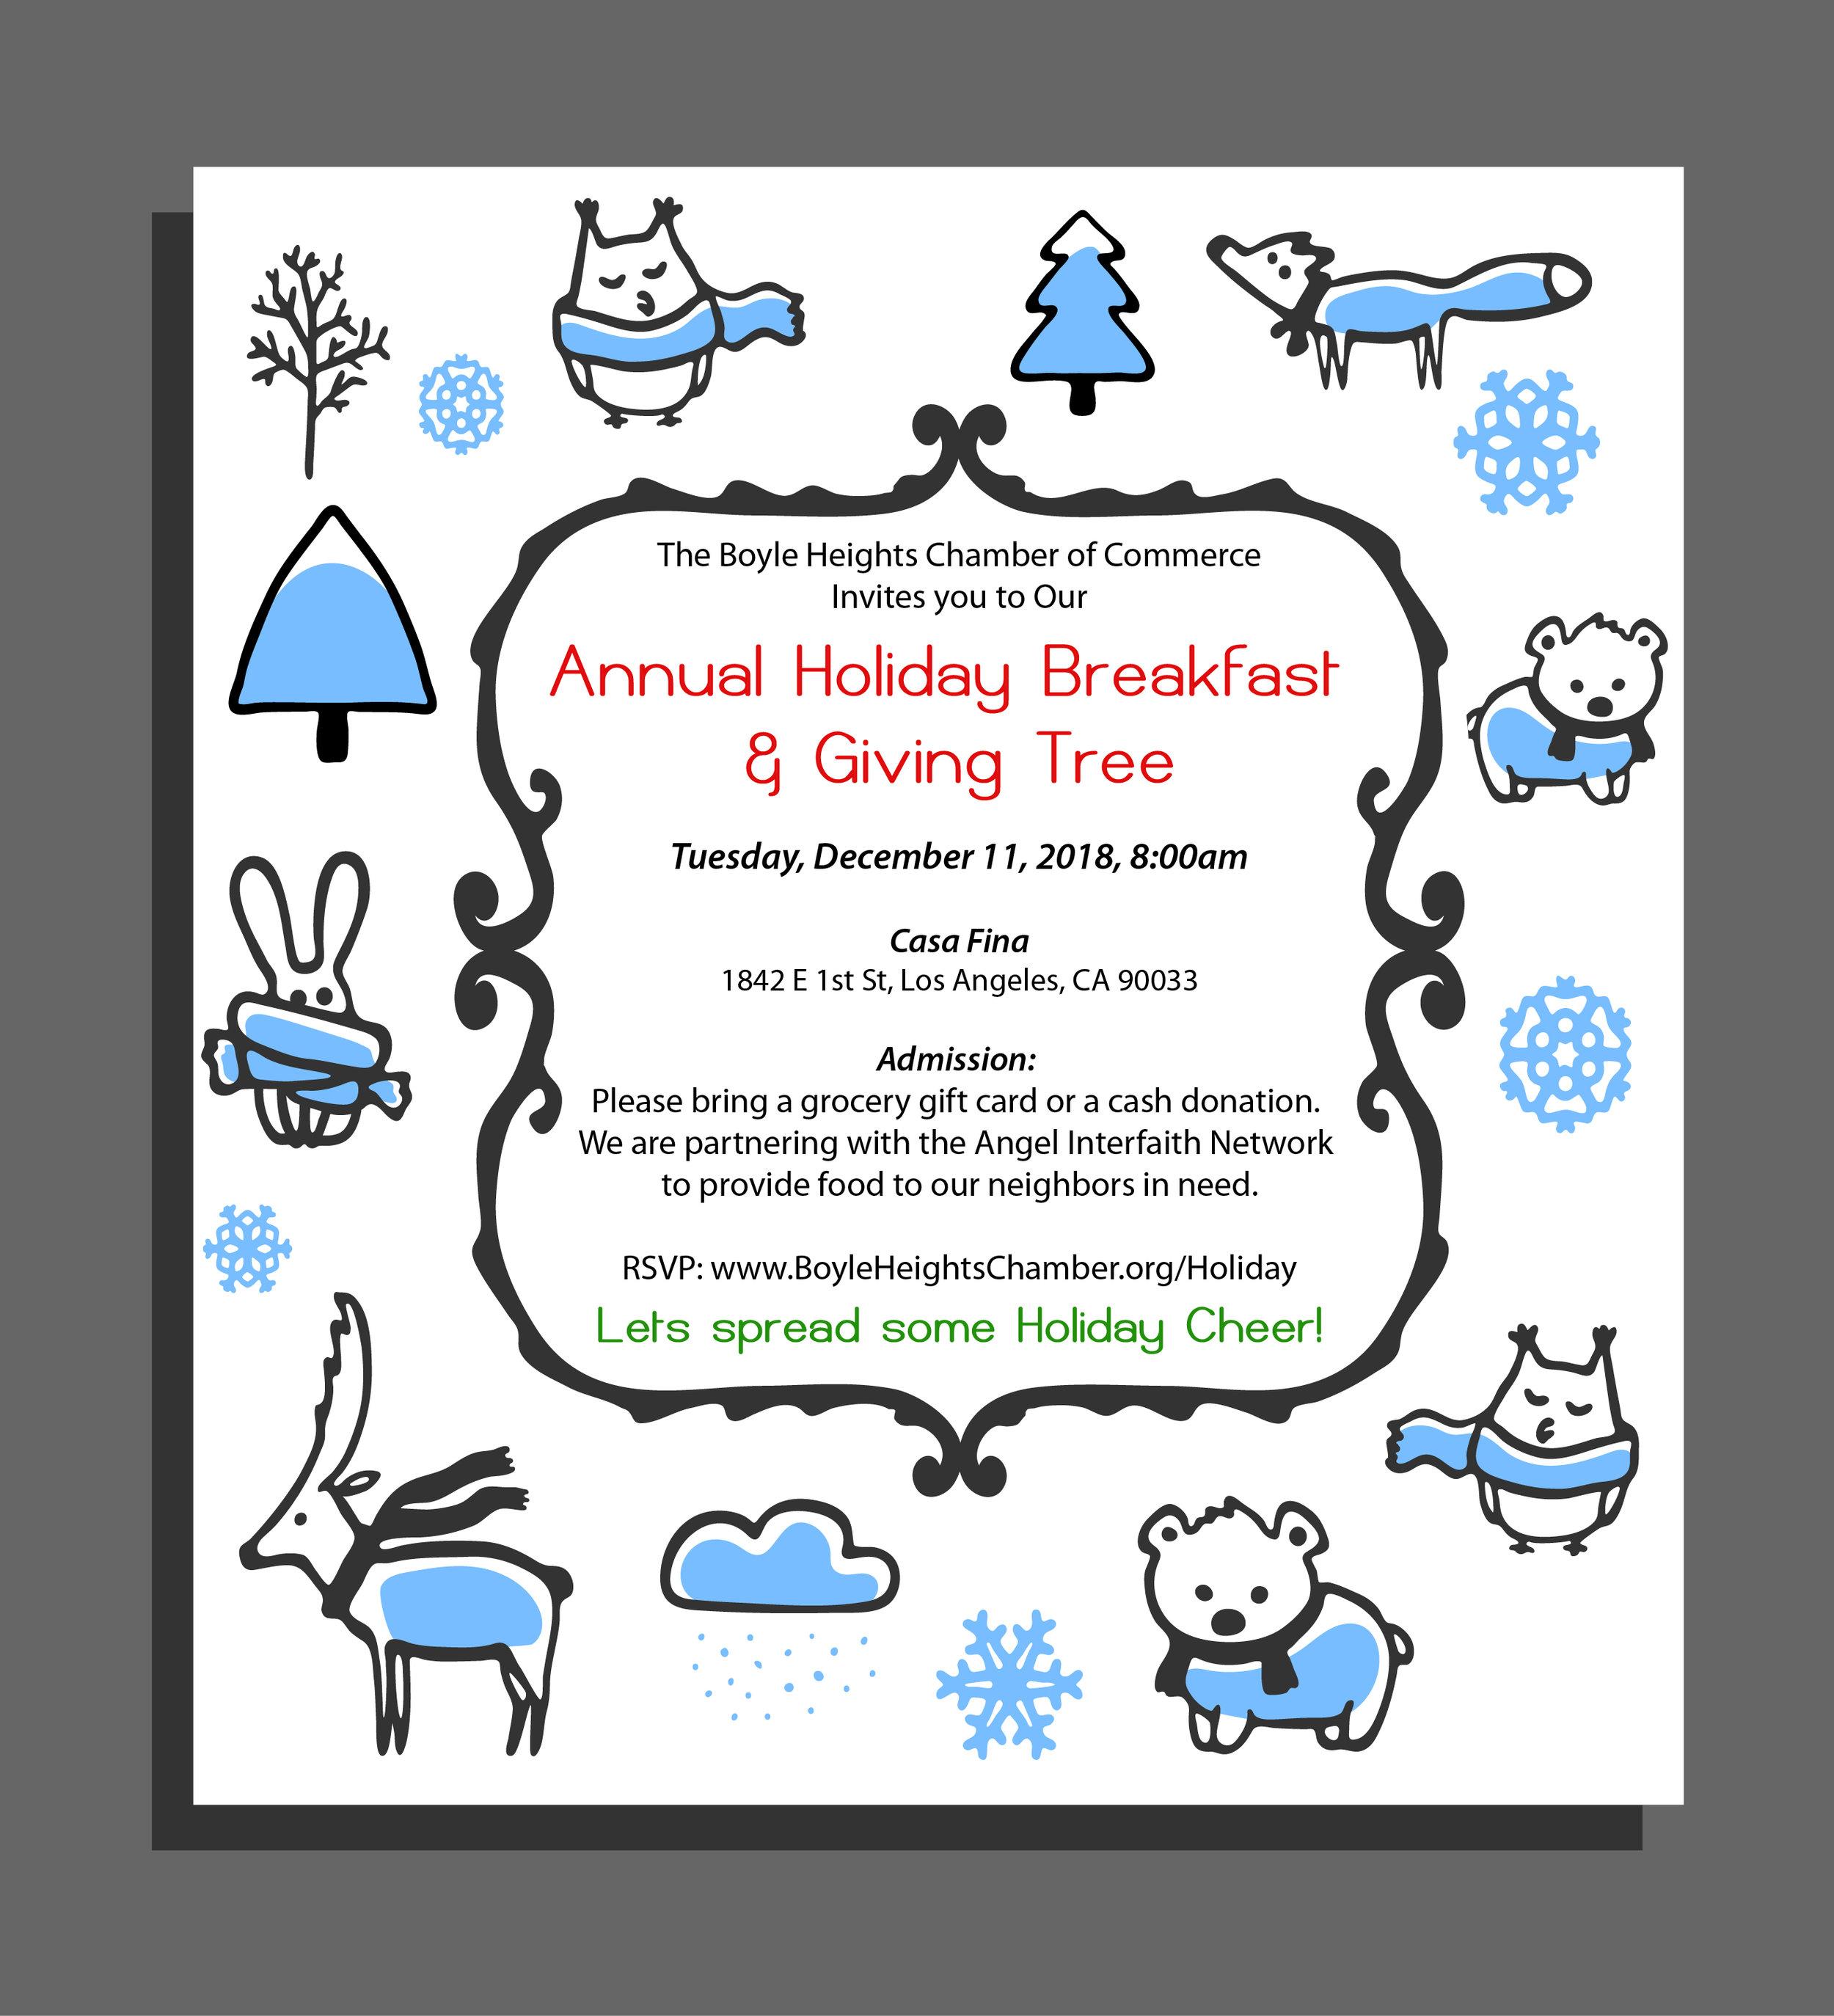 BHCC_HolidayBreakfast_2018web.jpg